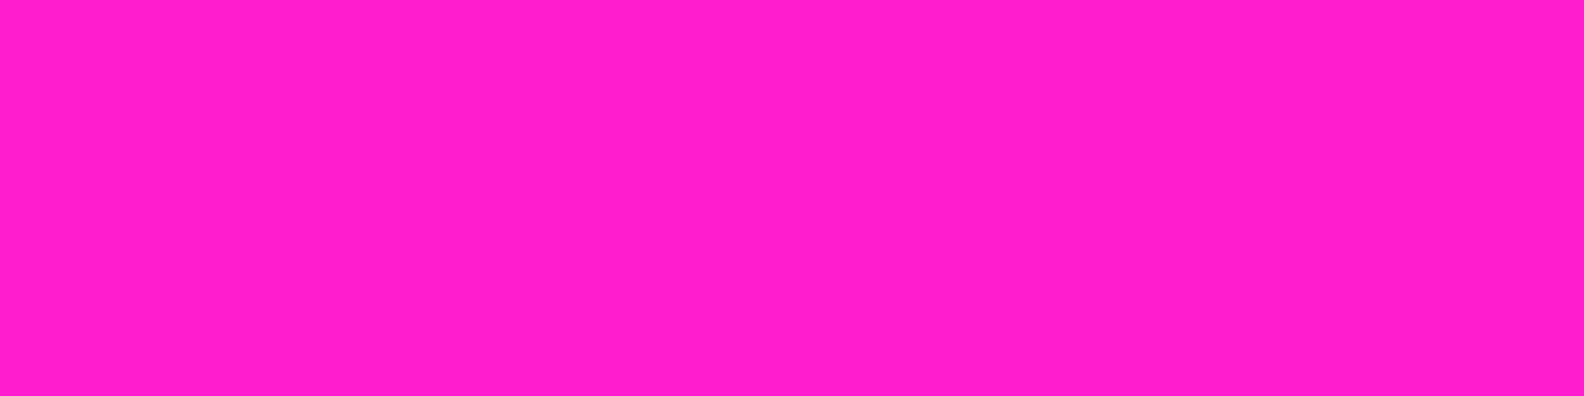 1584x396 Hot Magenta Solid Color Background